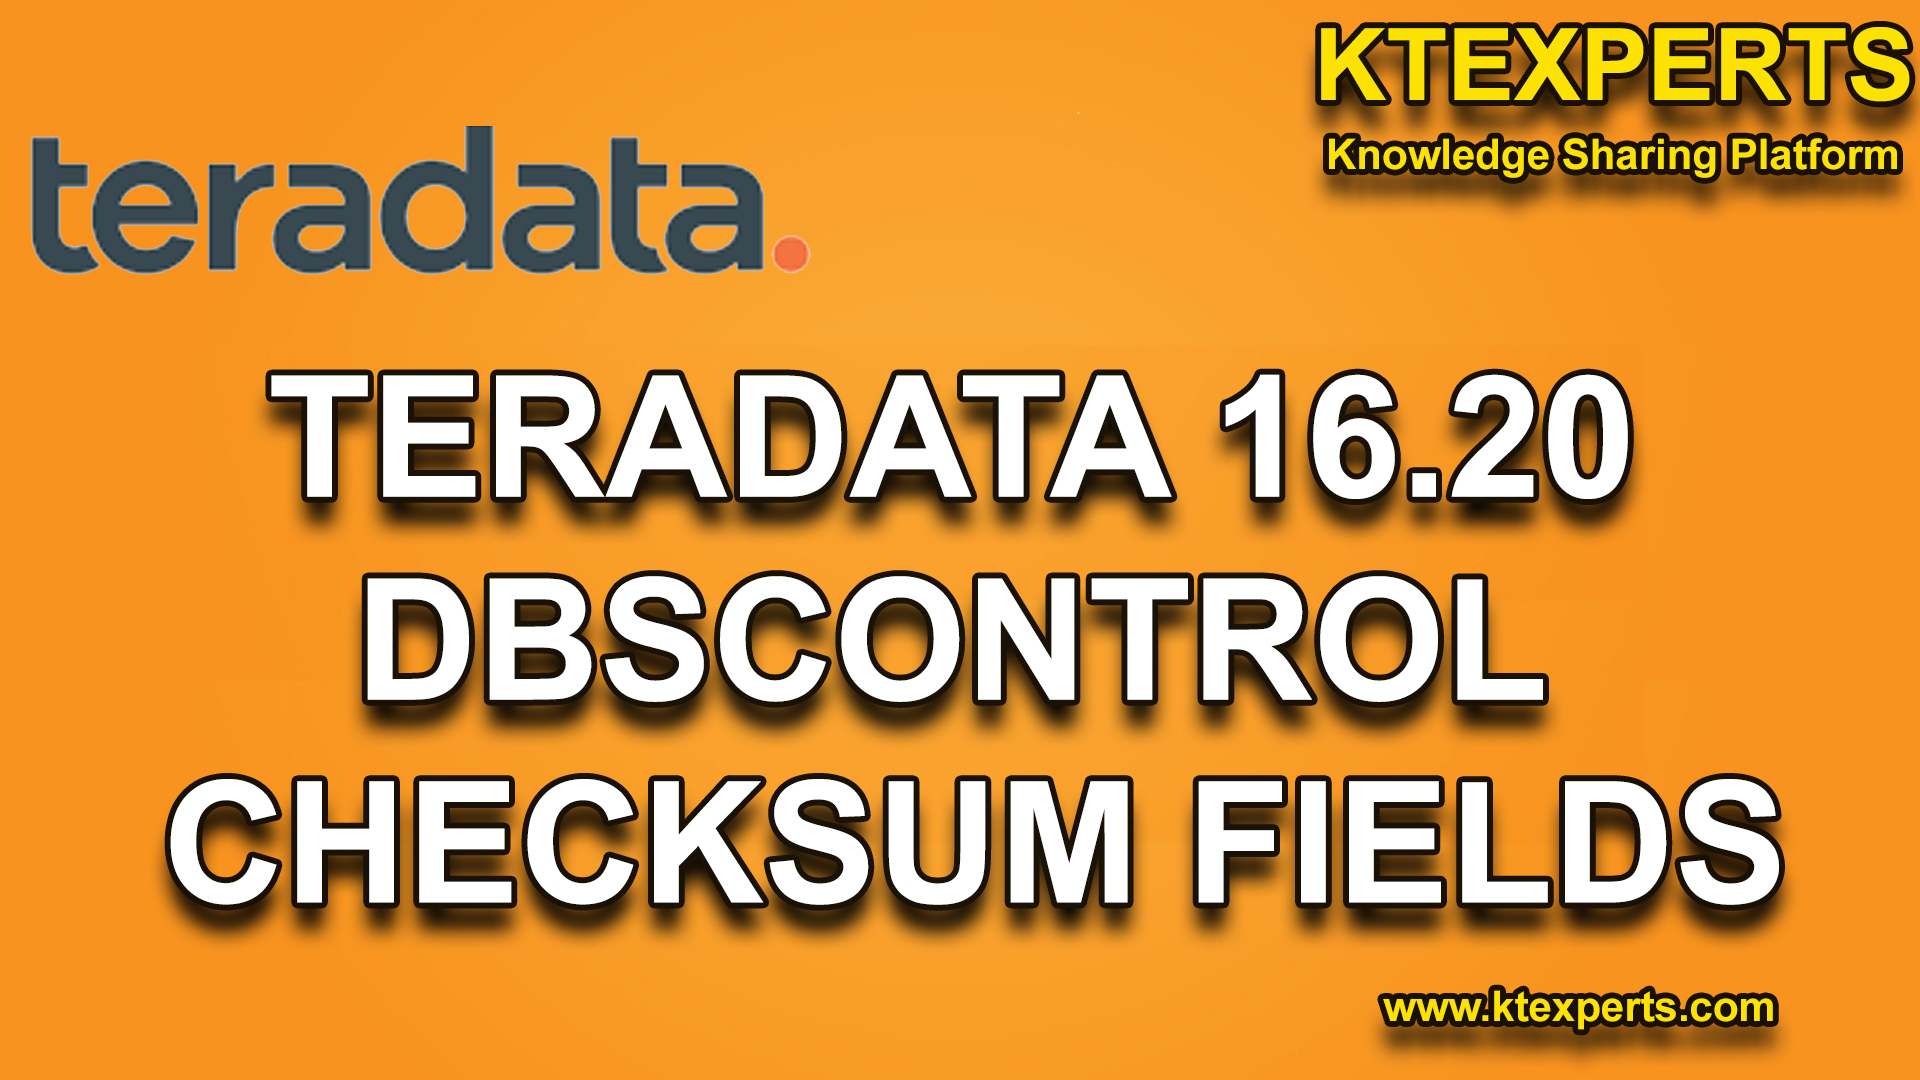 TERADATA 16.20 DBSCONTROL CHECKSUM FIELDS